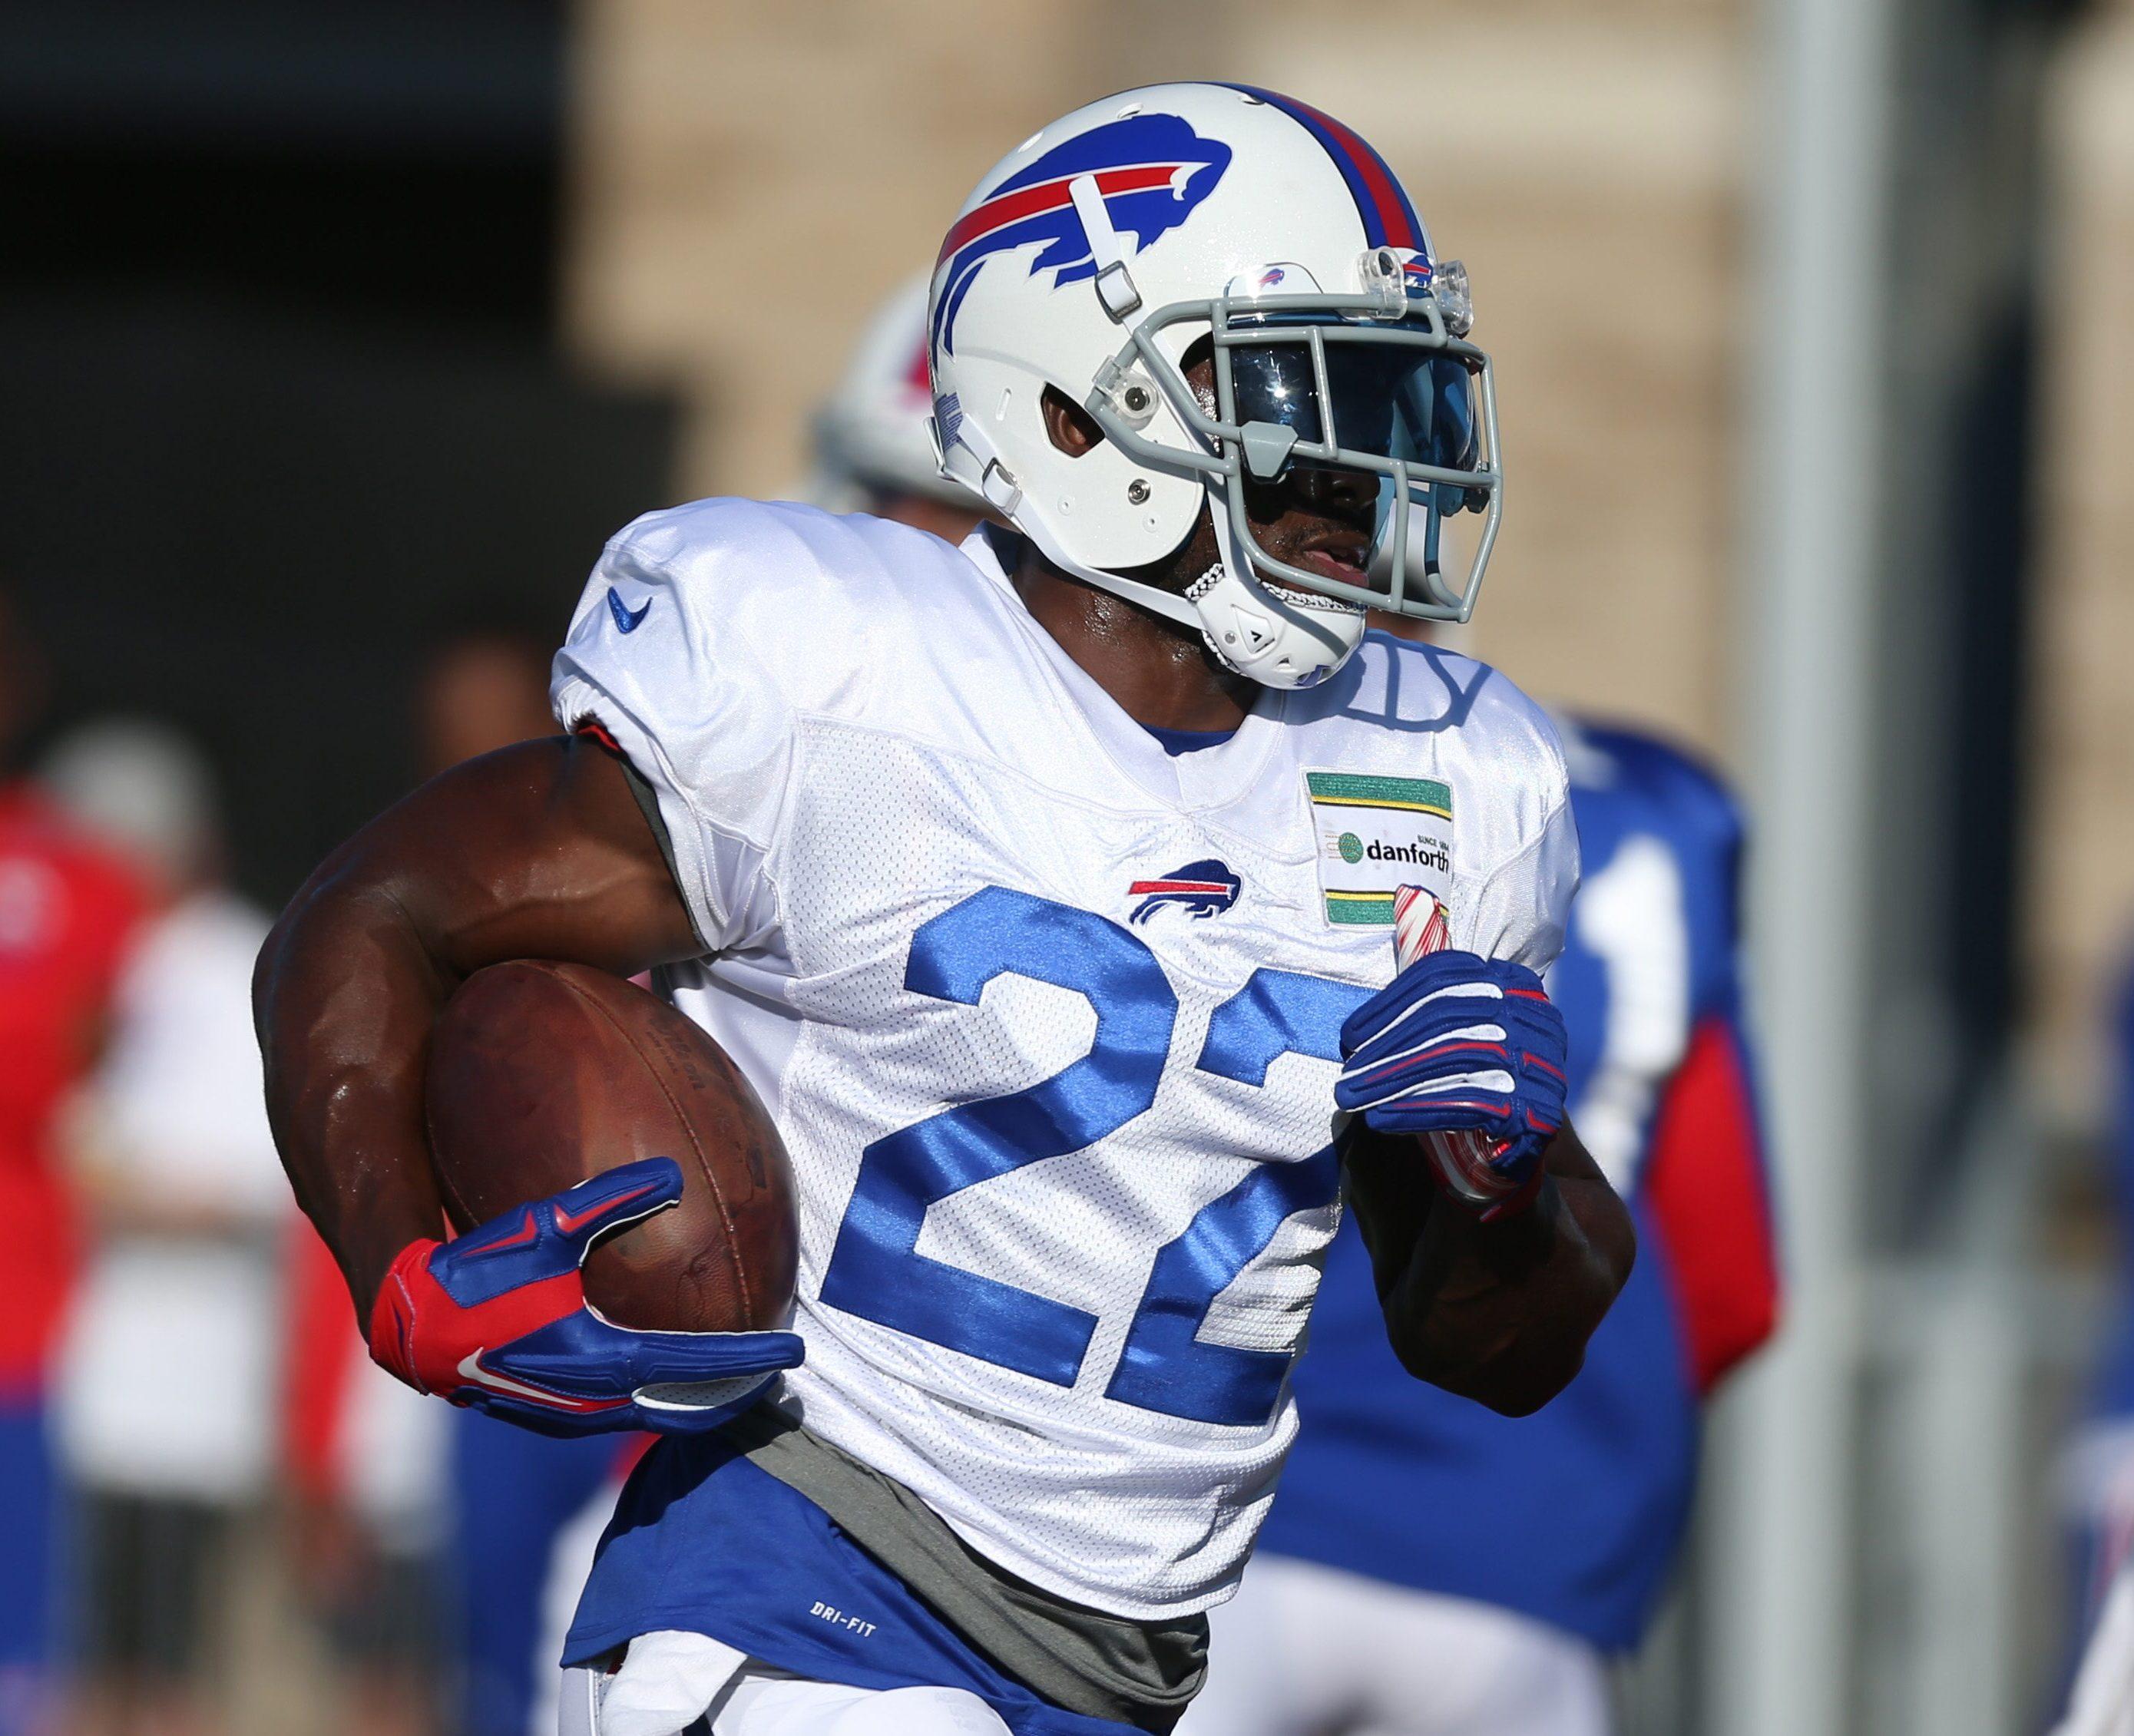 Despite a dismal 2016 season for the Buffalo Bills, veteran running back Reggie Bush would like to continue playing. (James P. McCoy/ Buffalo News)